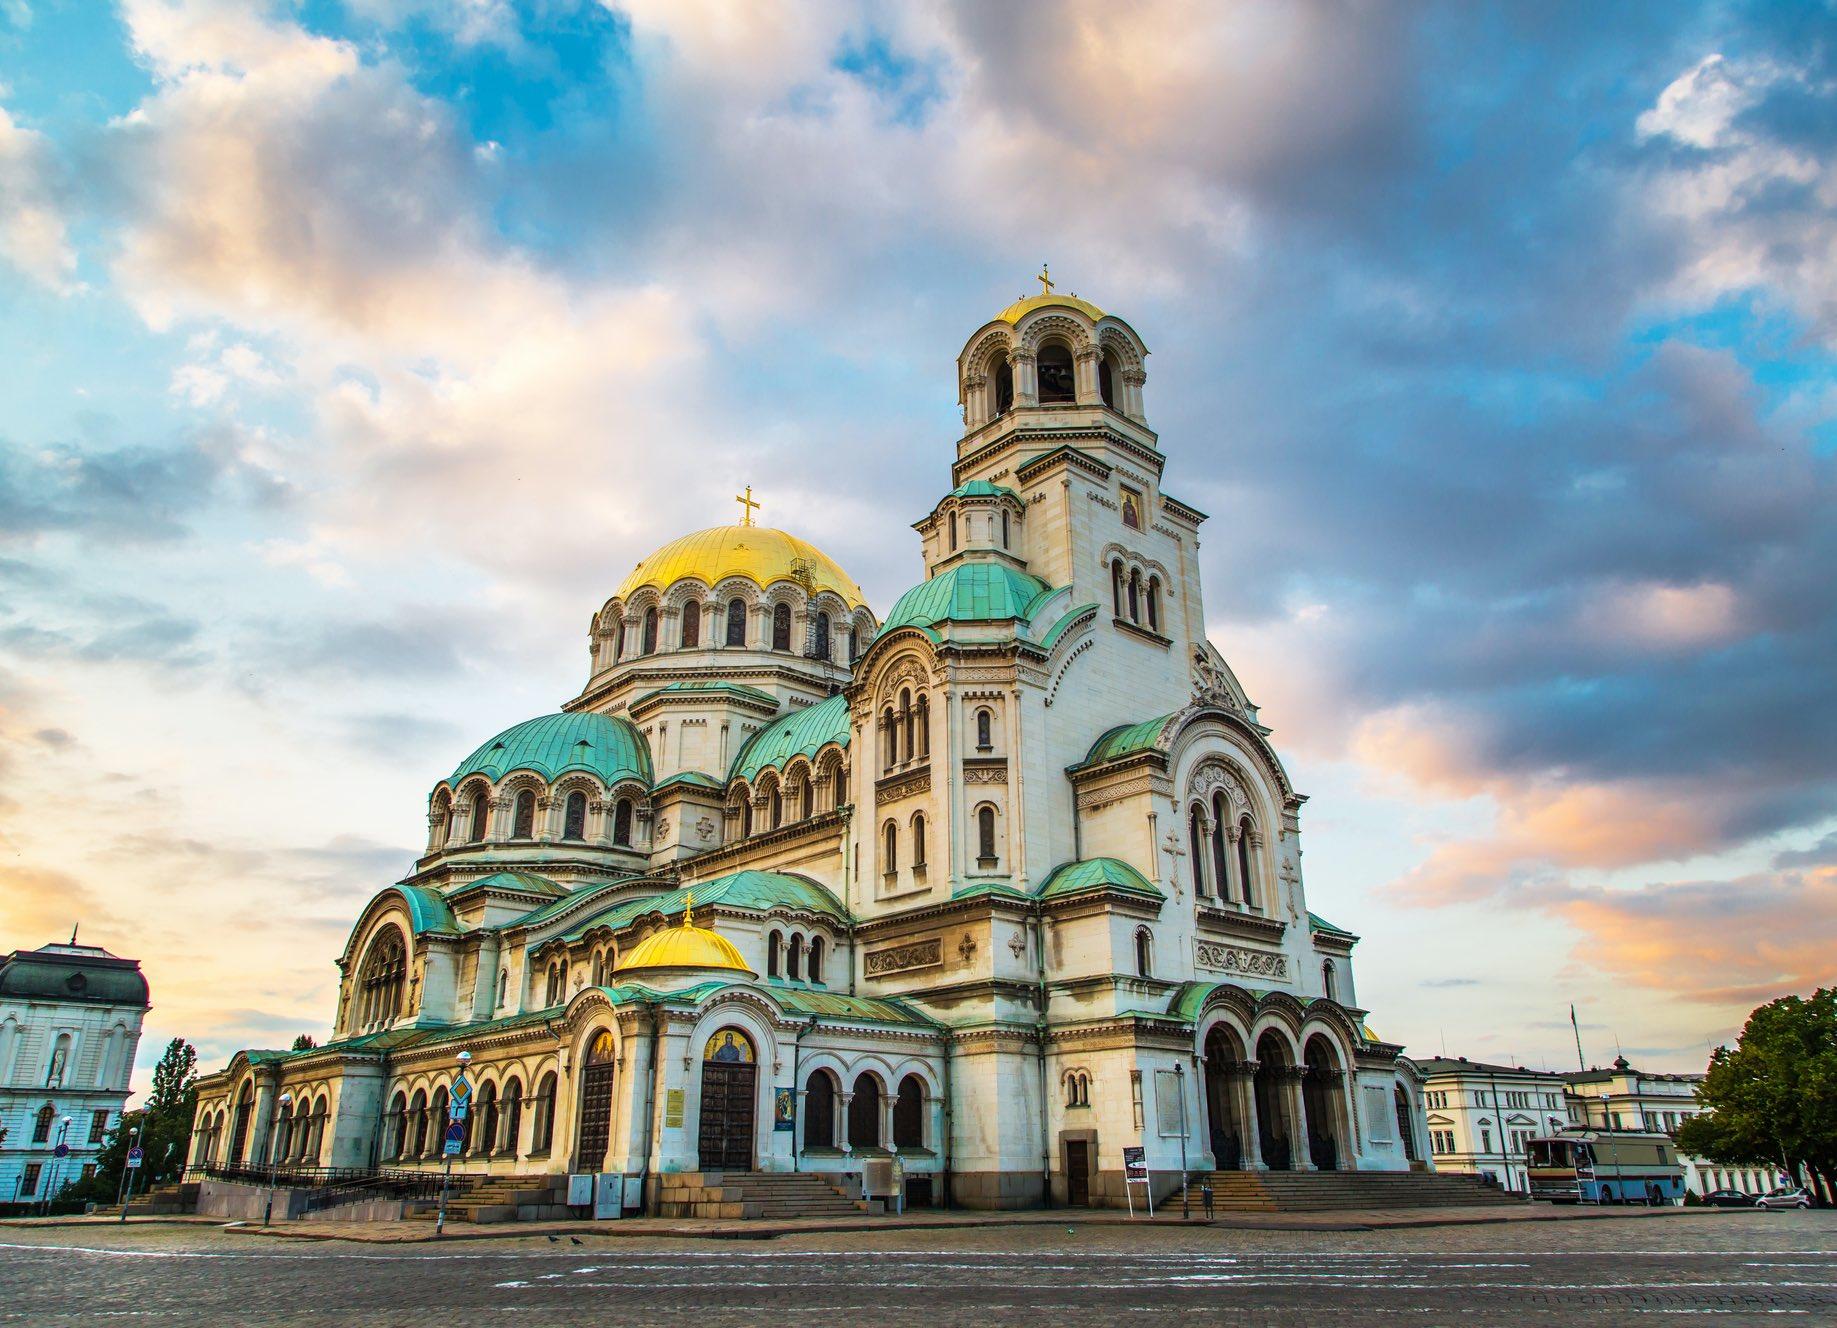 Sofia, Bulgaria - Cheapest Cities in Europe